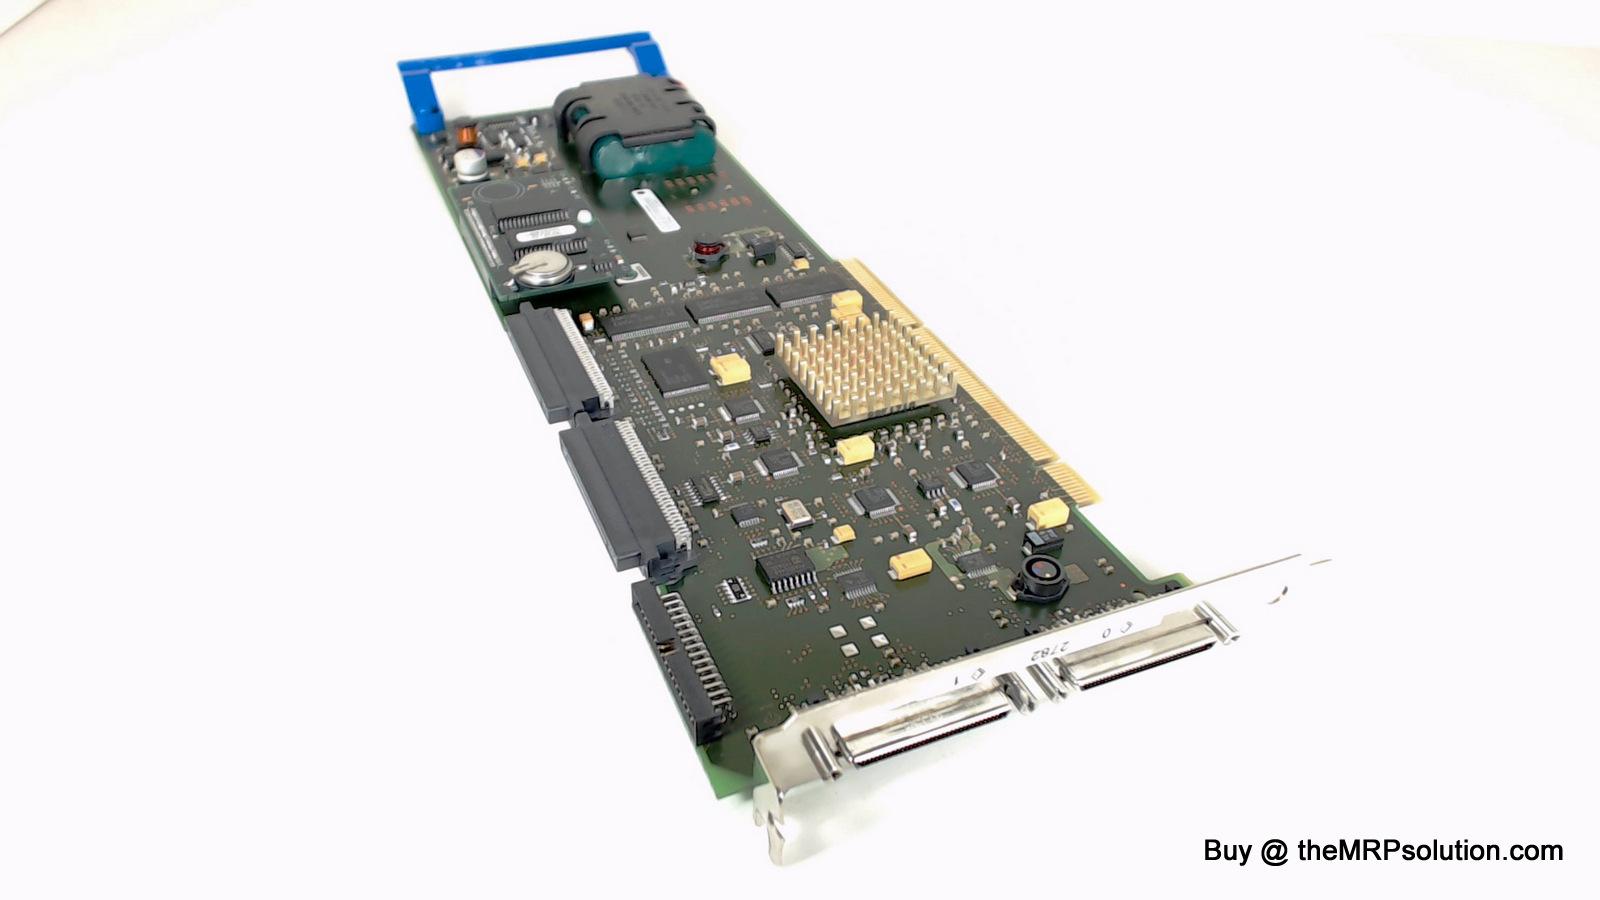 IBM 53P2829 PCI-X DUAL CHANNEL RAID CONTROLLER Refurbished